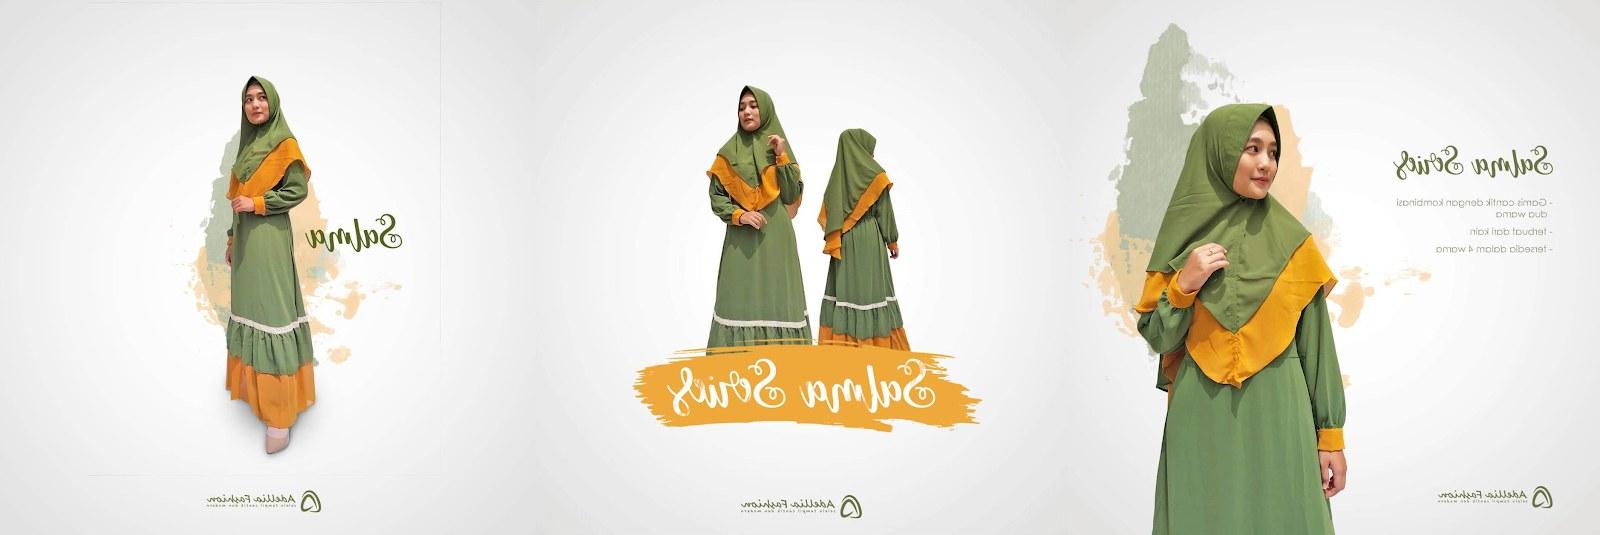 Bentuk Fashion Muslimah Terbaru 2020 Nkde Rekomendasi Gamis Muslimah Terbaru 2020 Adellia Fashion